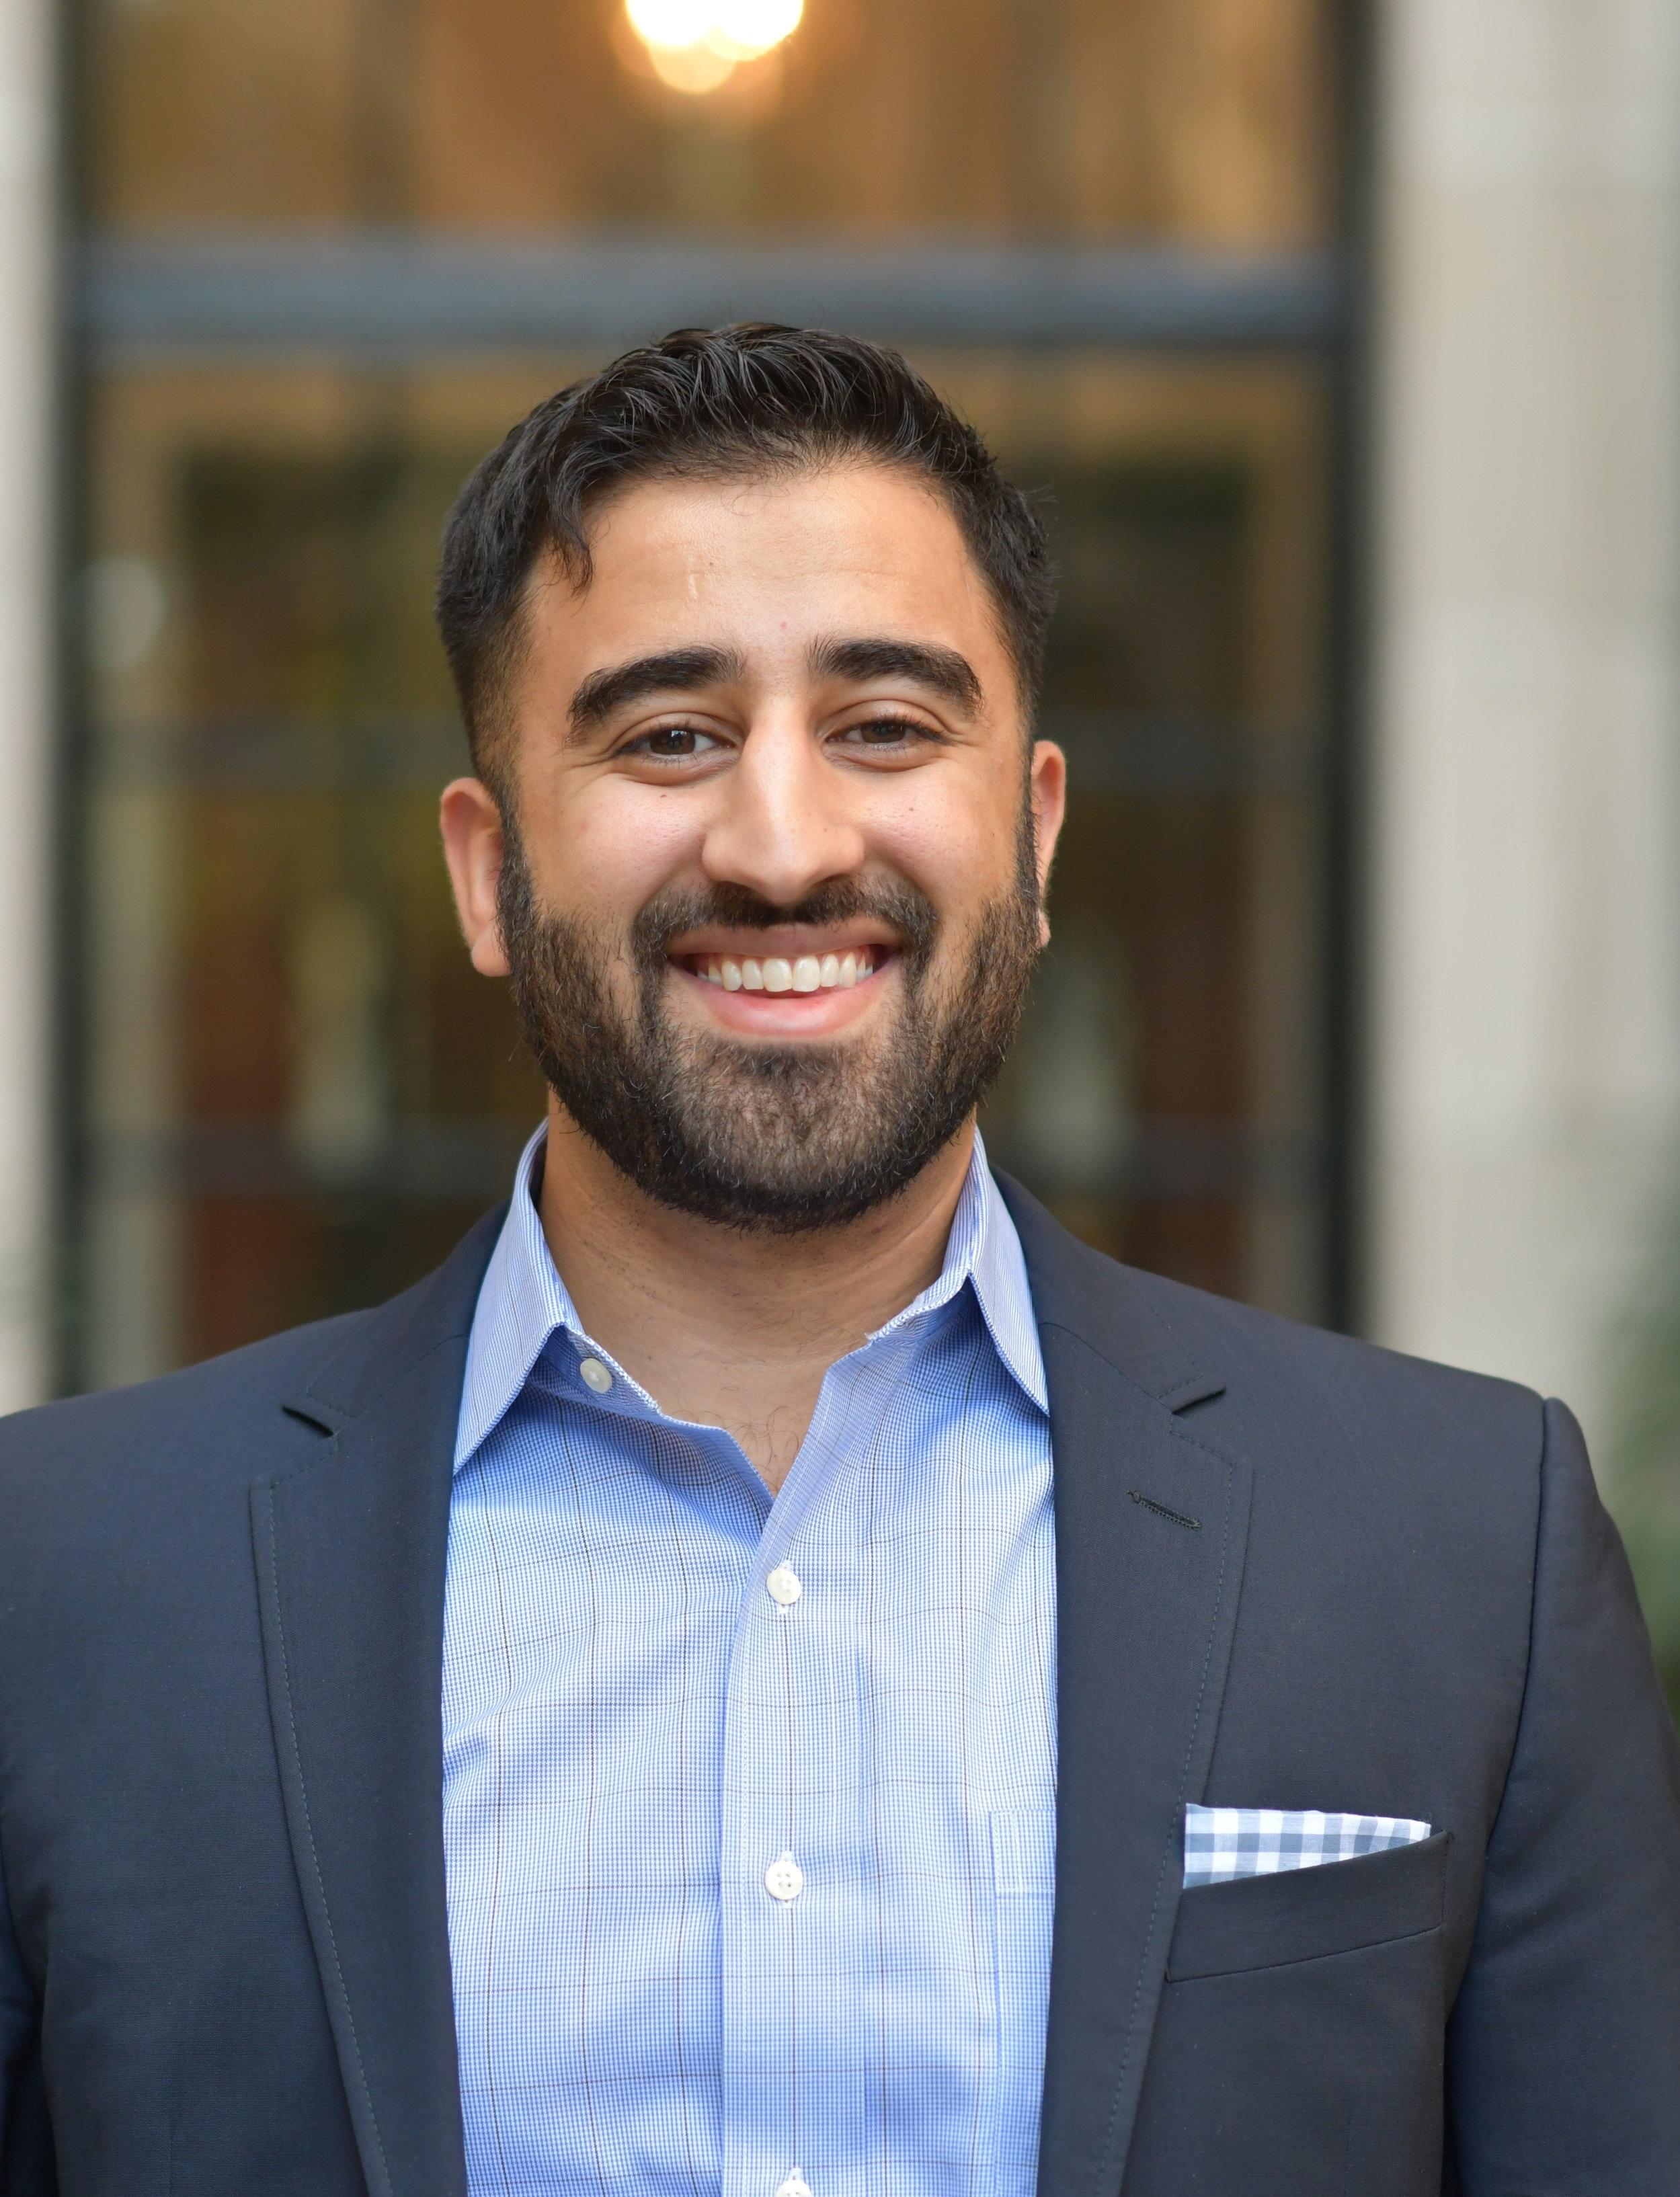 Ibrahim Bengali - The Wharton School MBA Candidate(Moderator)